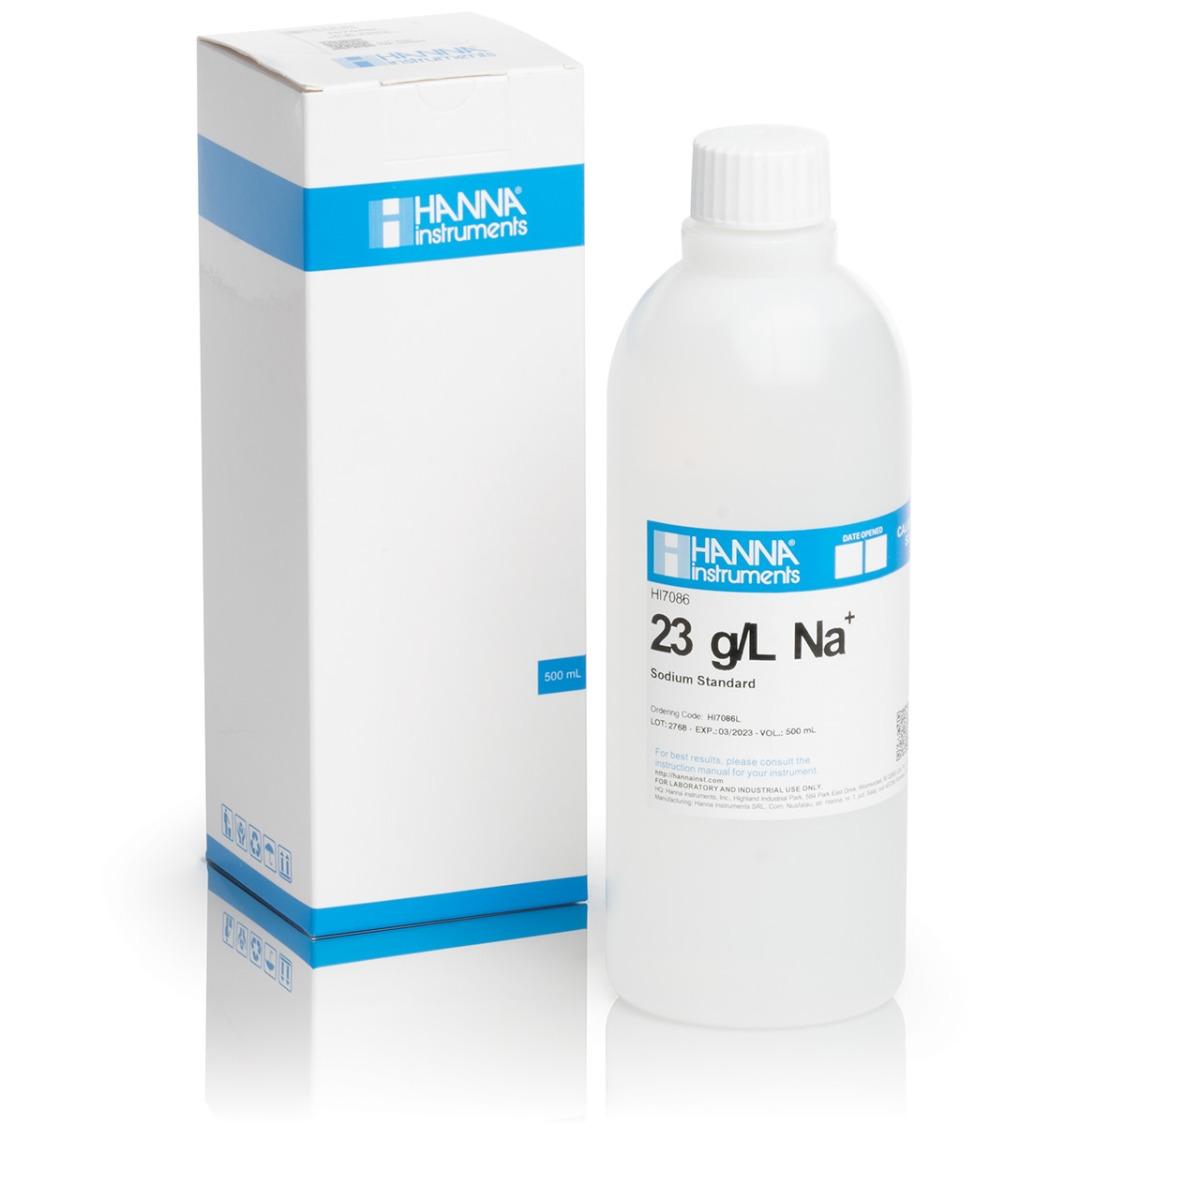 Solución Estándar de Sodio de 23 g / L, 500 mL - HI7086L